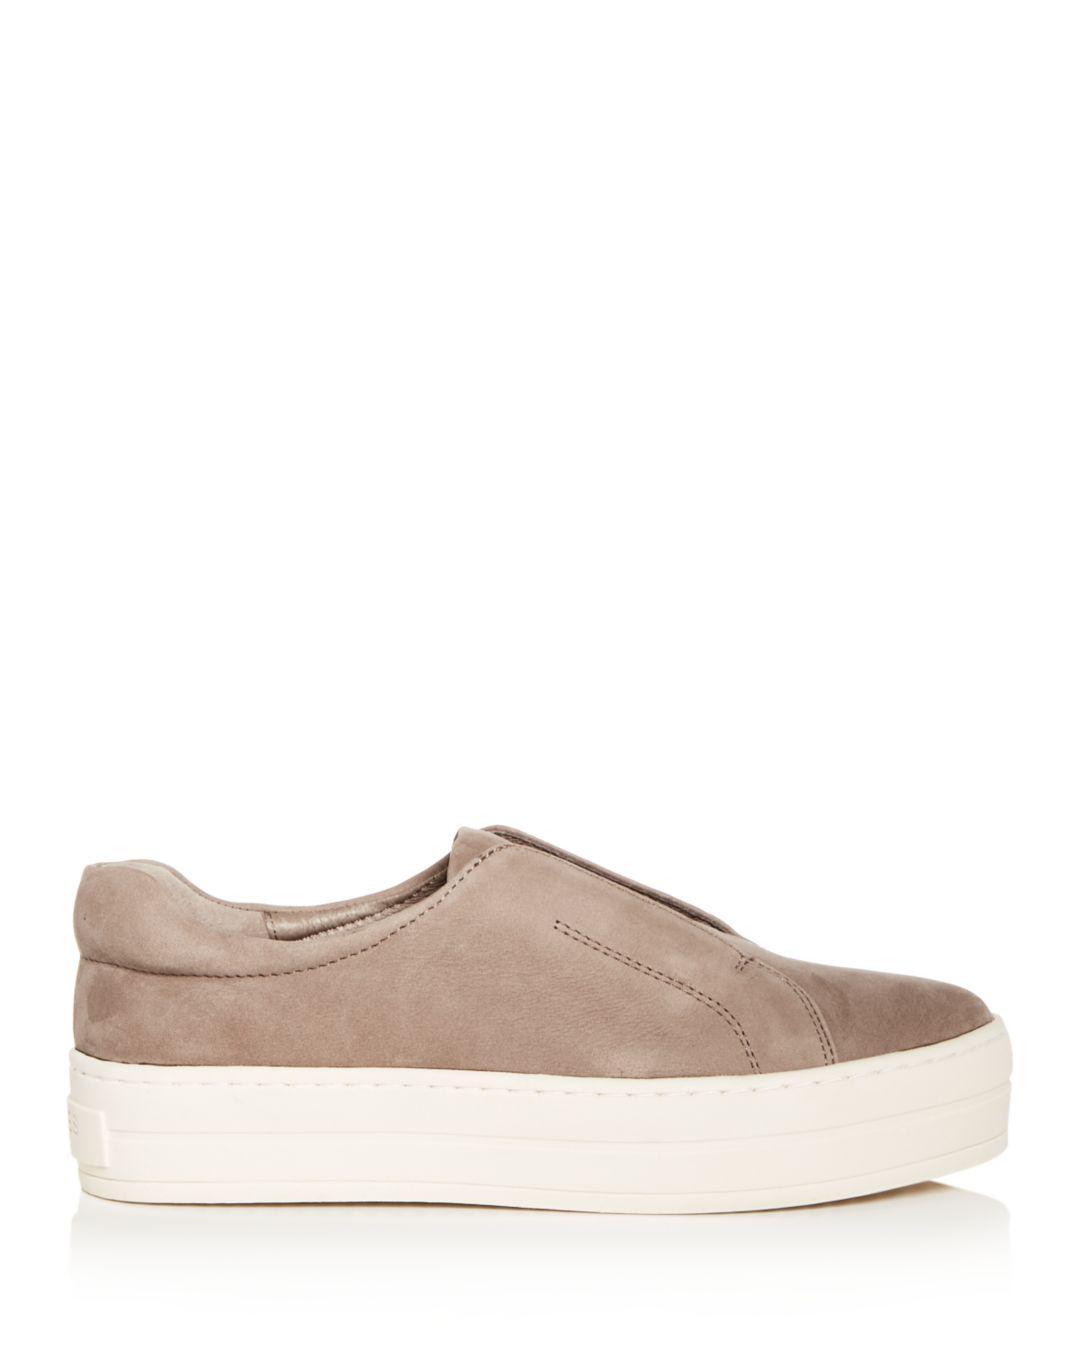 285900e286d28 J/Slides Women's Heidi Leather Slip-on Platform Sneakers in Brown - Save  5.882352941176464% - Lyst